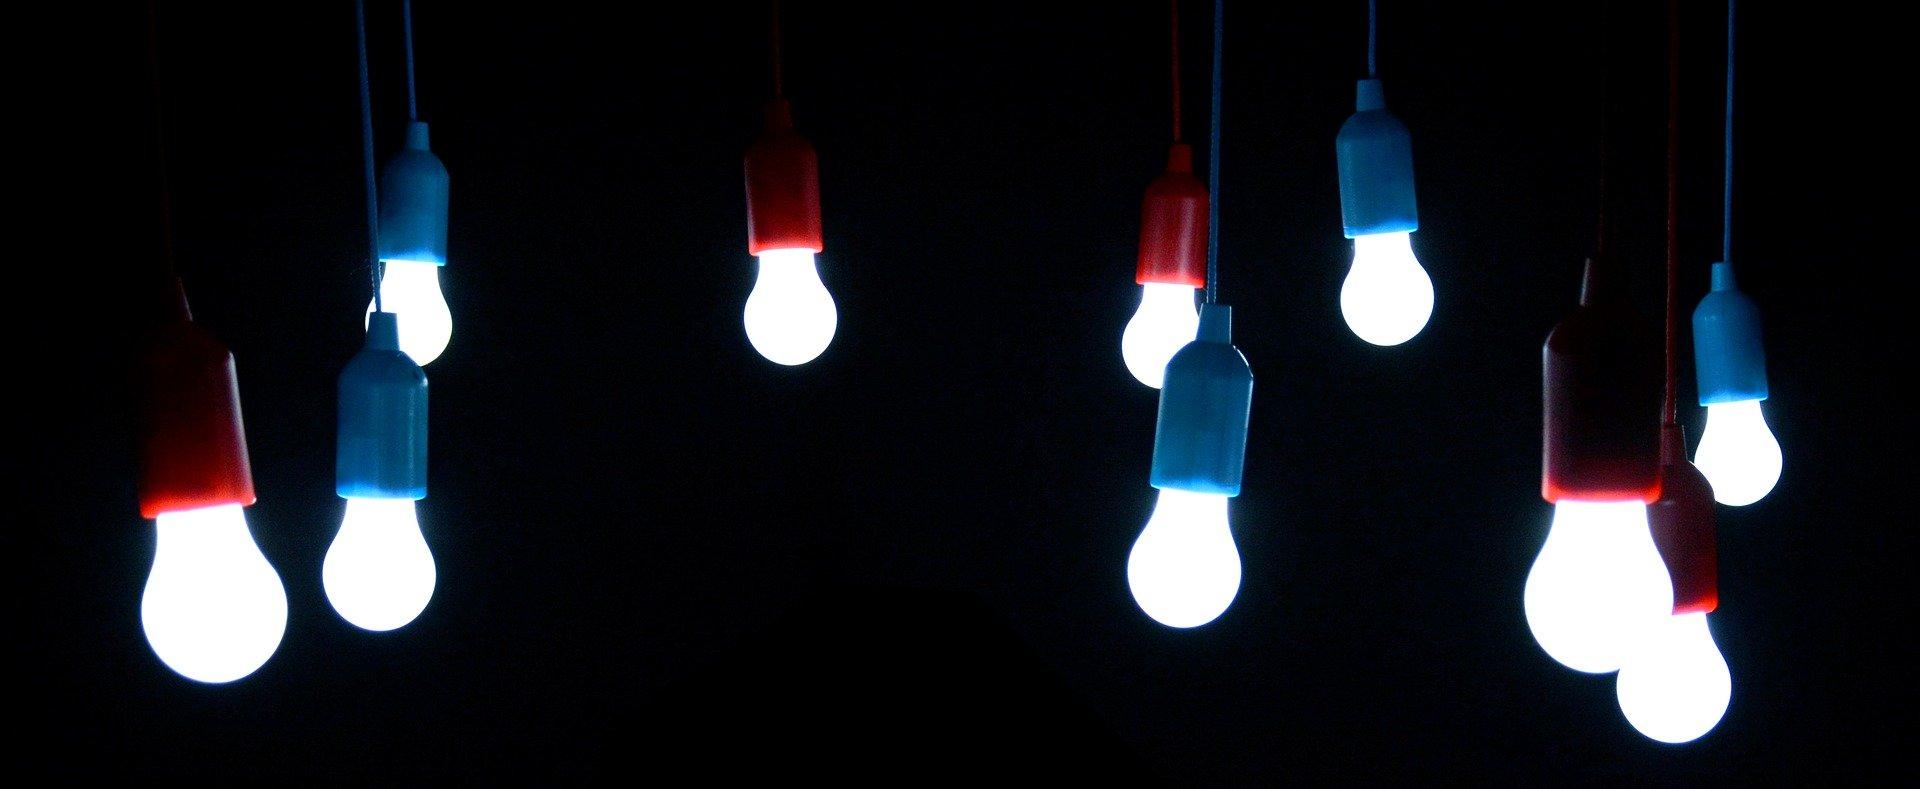 light-bulbs-1822058_1920.jpg